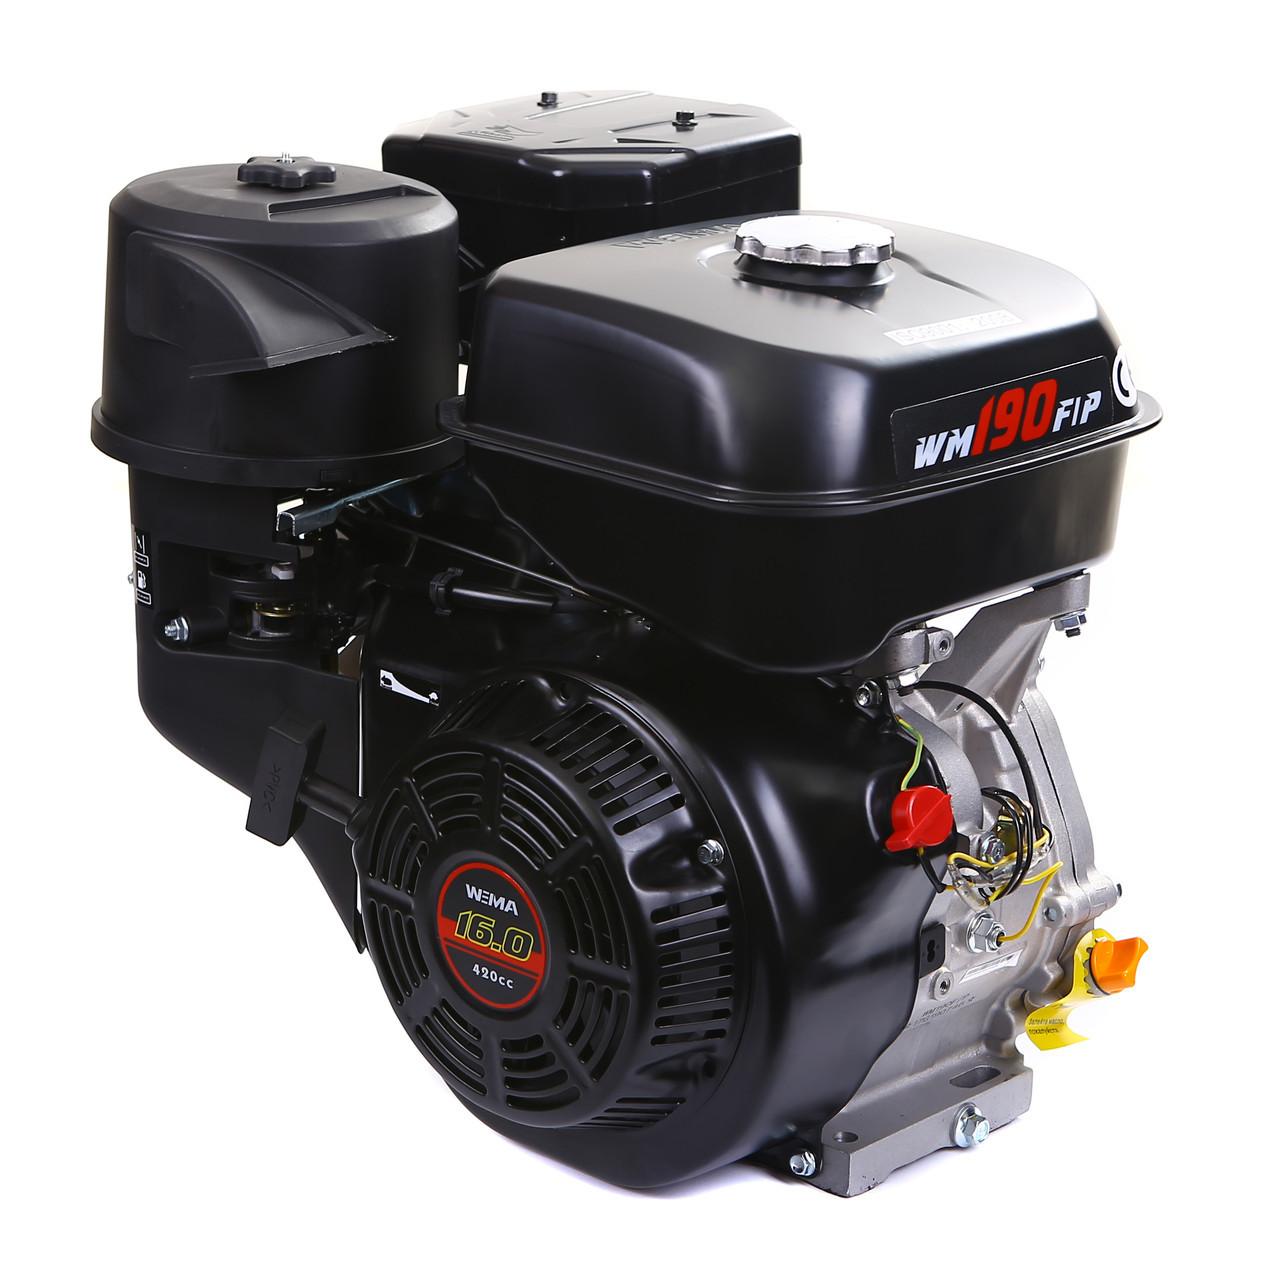 Двигун бензиновий Weima WM190F-S ЄВРО 5 (шпонка, 25 мм, 16 л. с., ручний стартер)